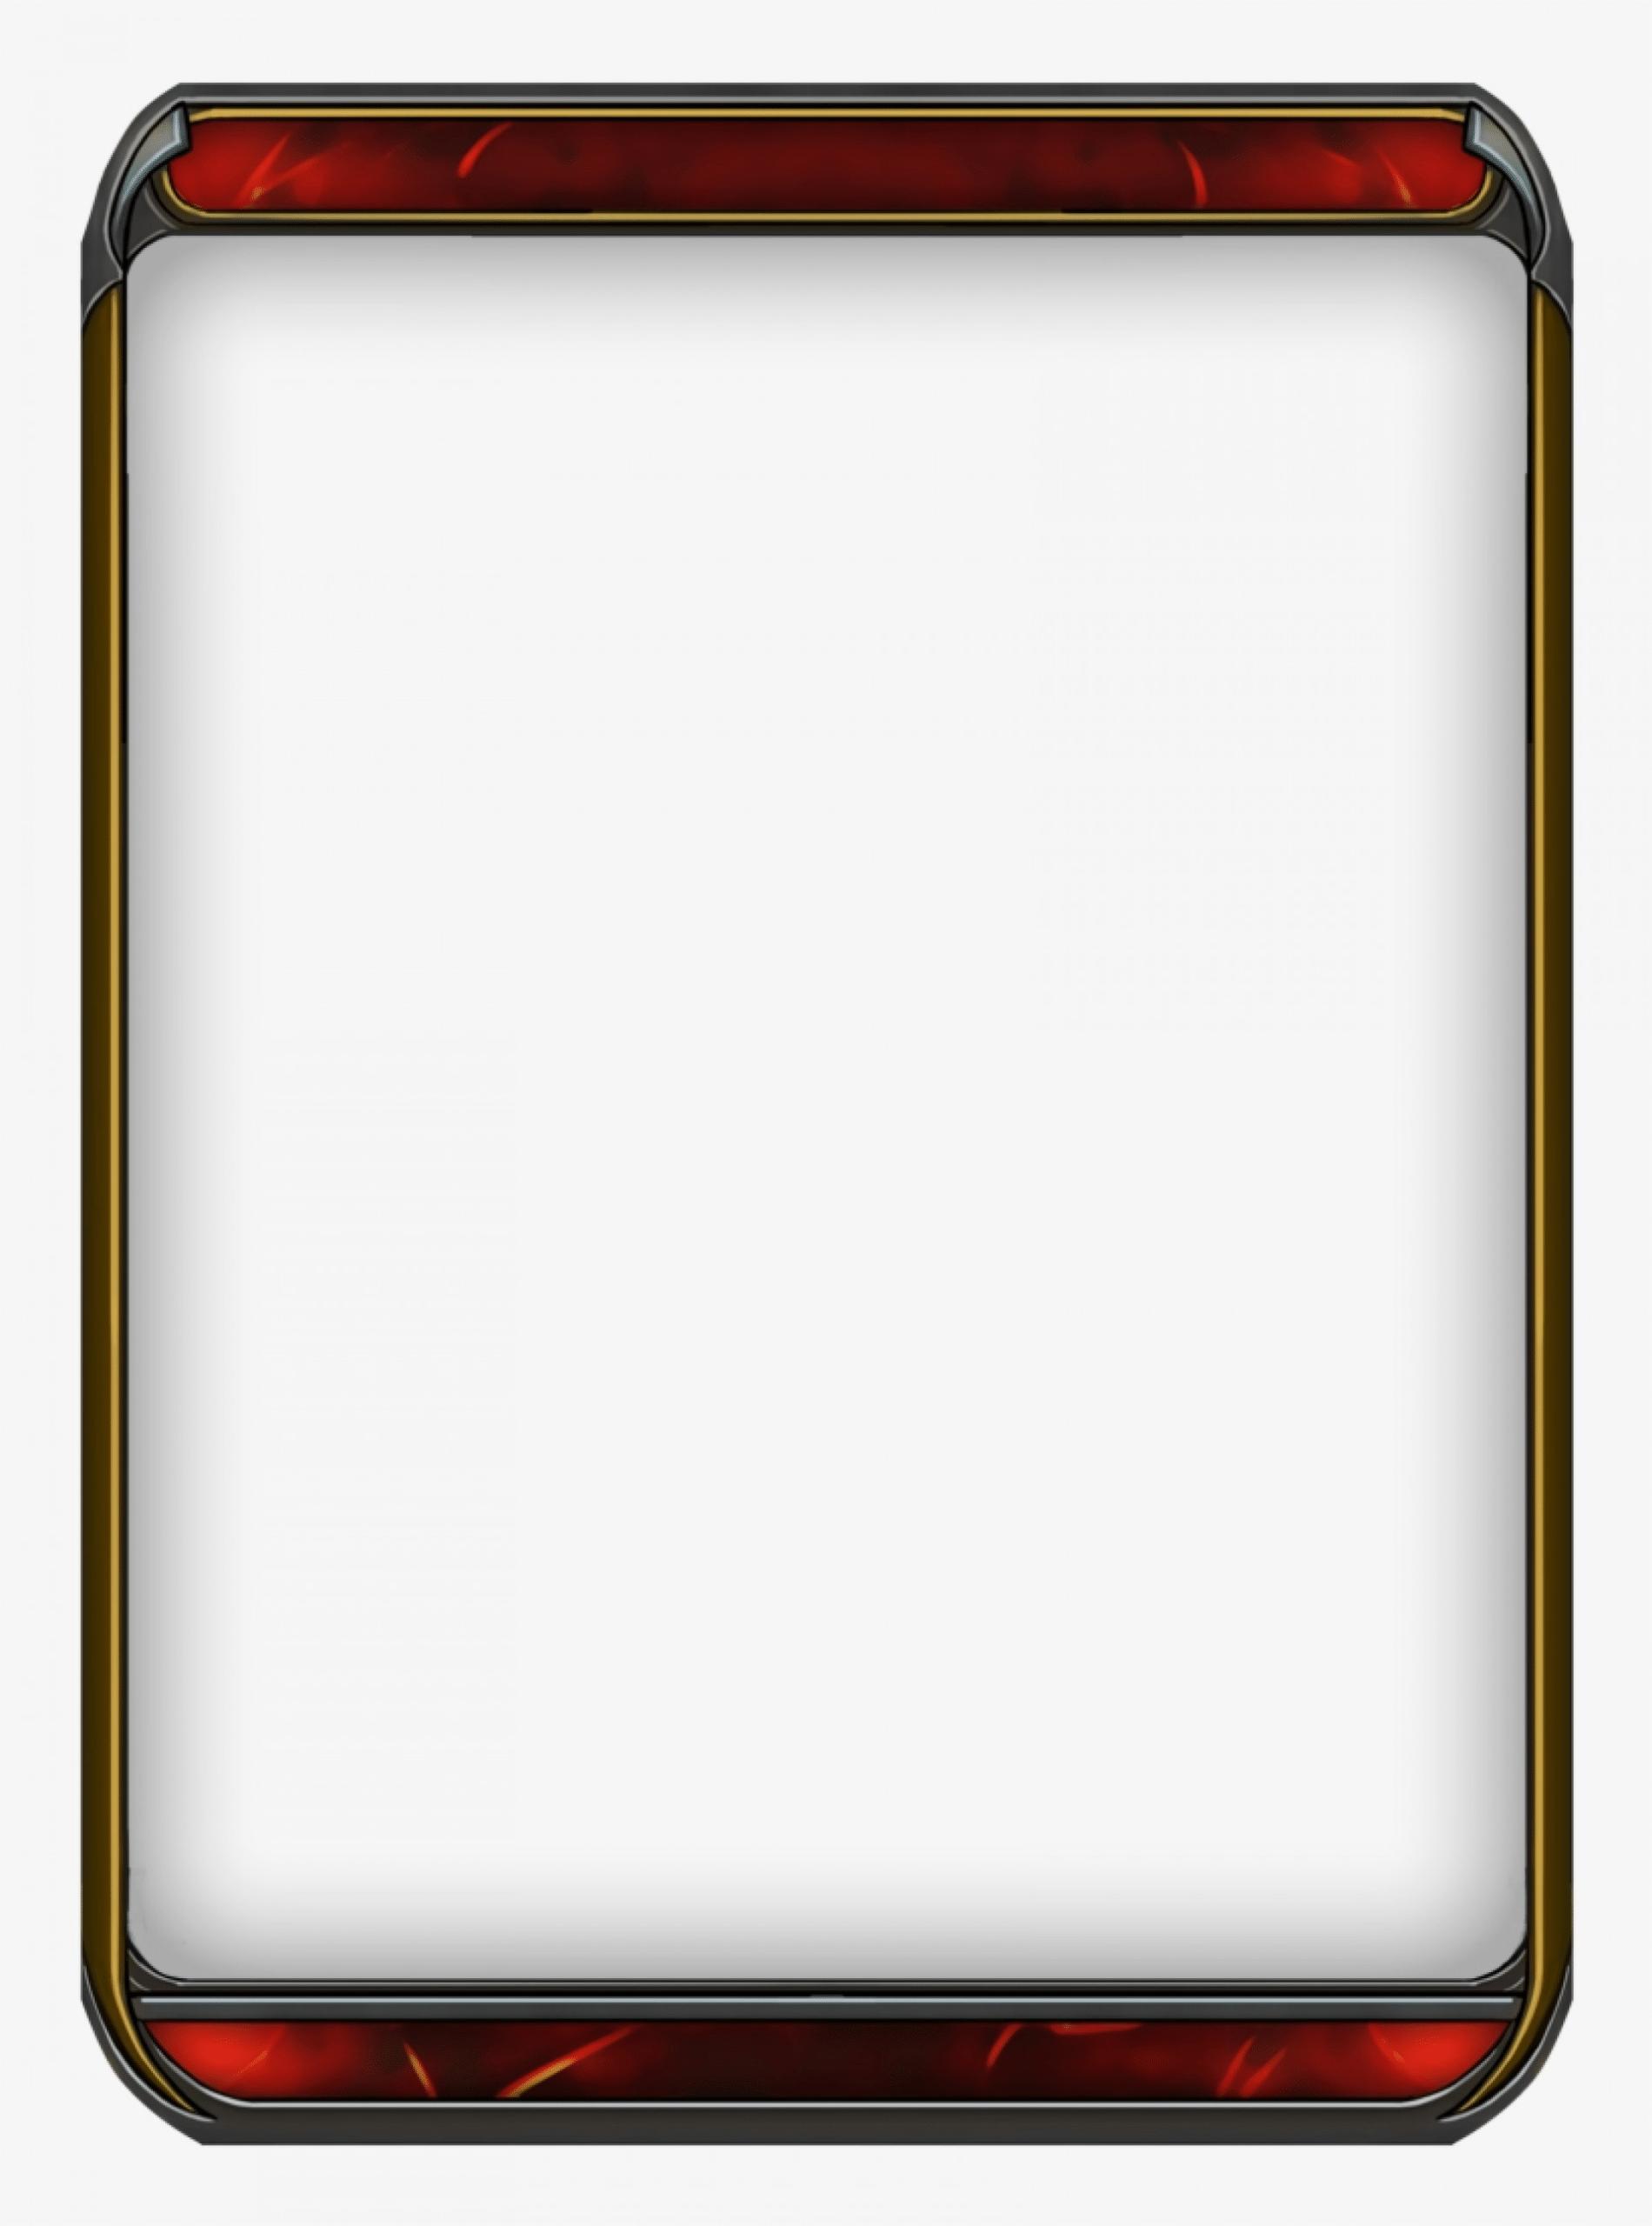 031 Template Ideas Free Printable Baseball Trading Card intended for Trading Cards Templates Free Download